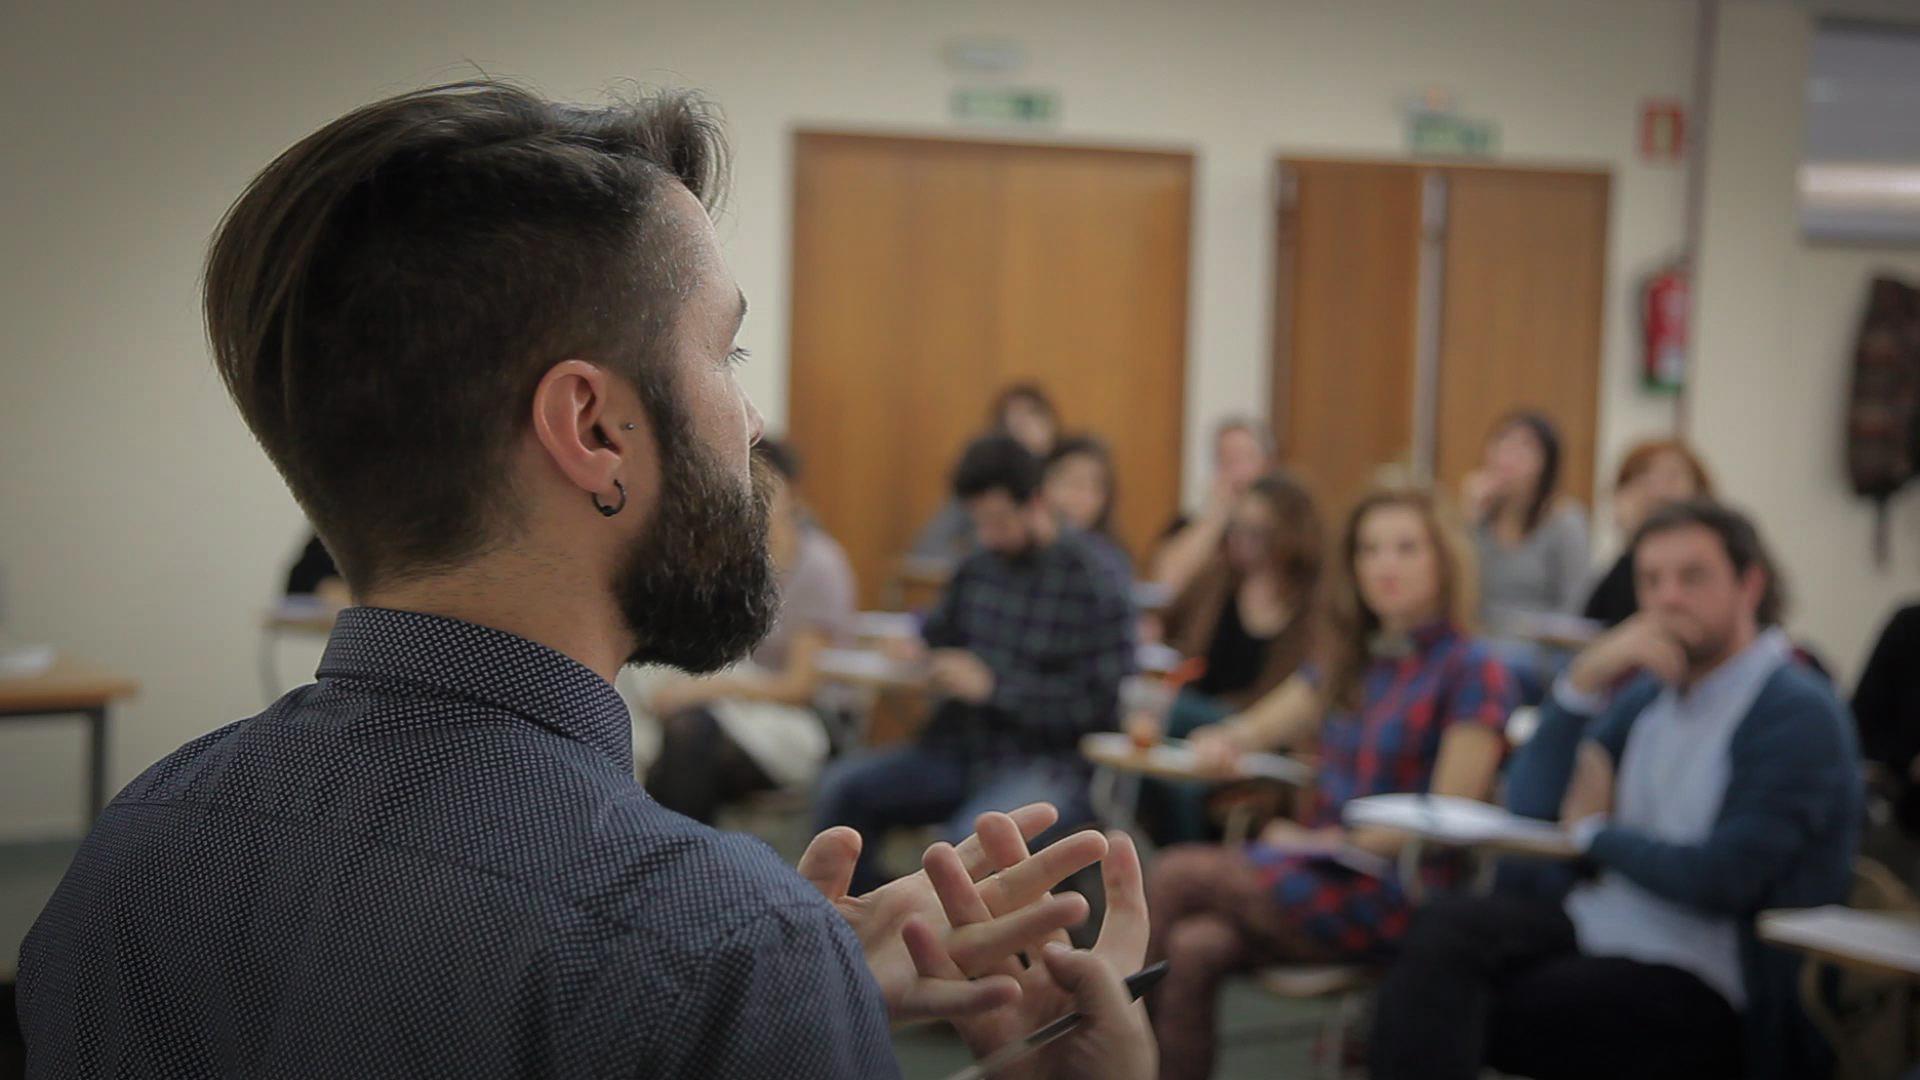 2015 11 20 sesión Diego Parajó - fotos Damián Miramemira 2